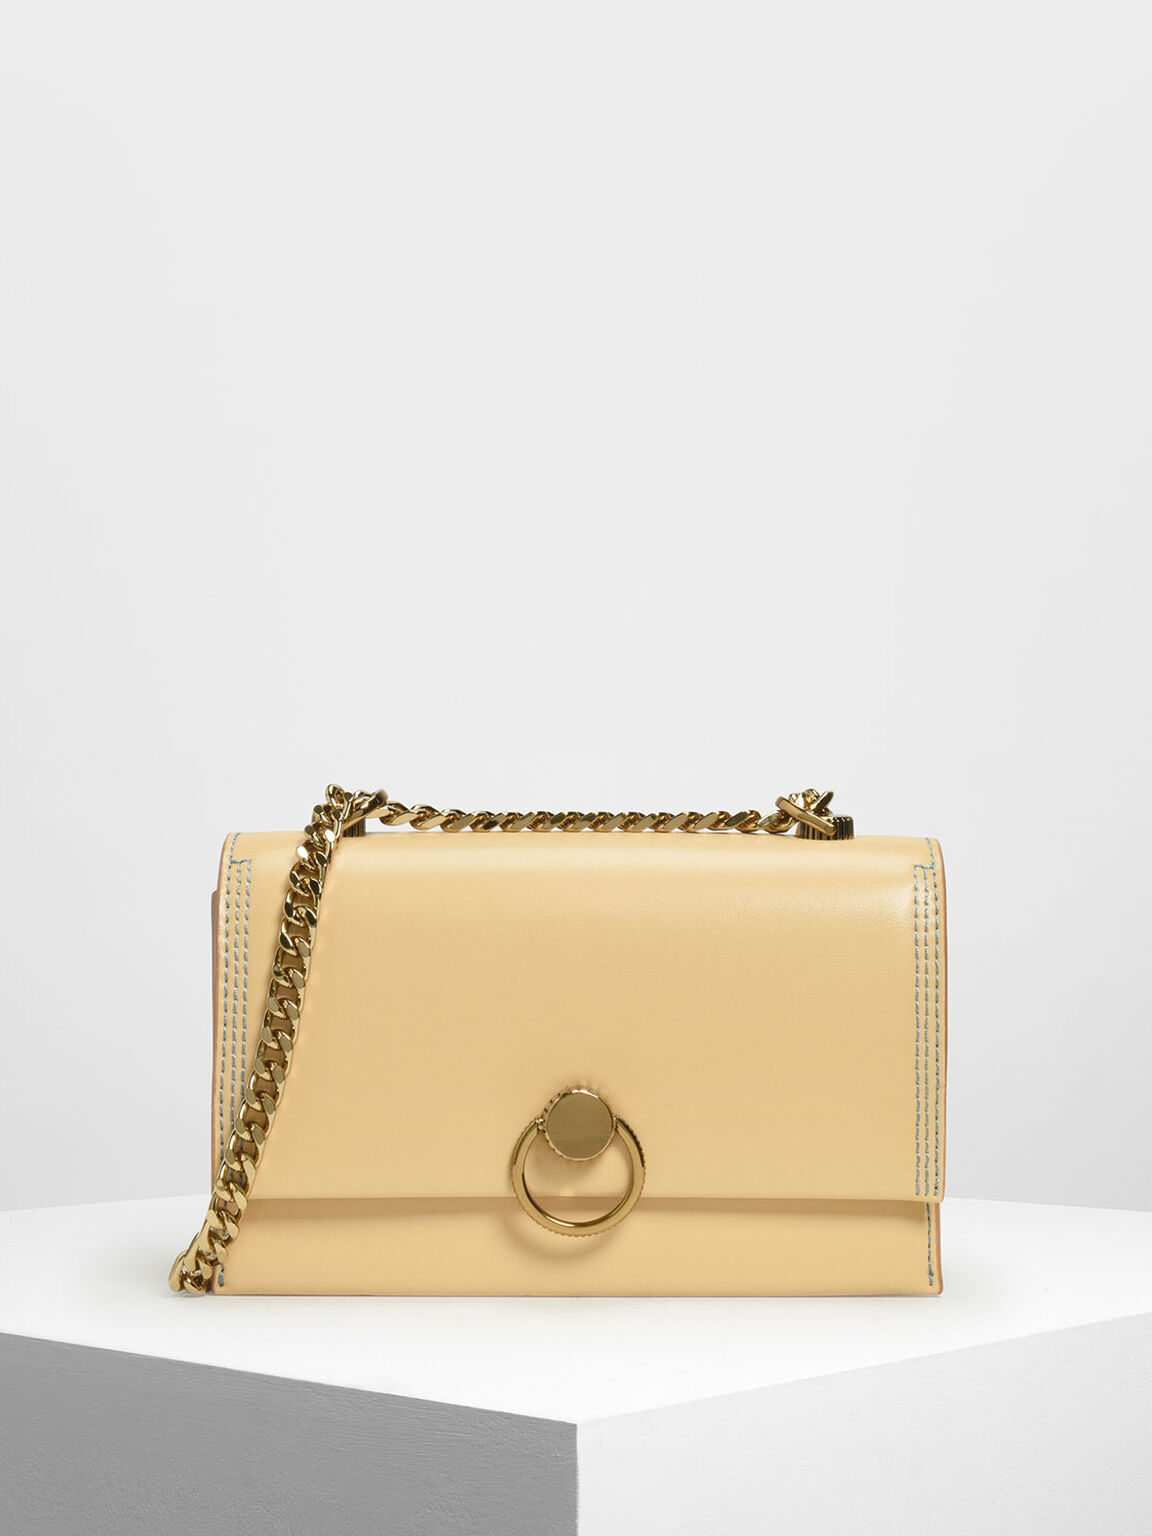 Chain & Strap Push Lock Shoulder Bag, Yellow, hi-res